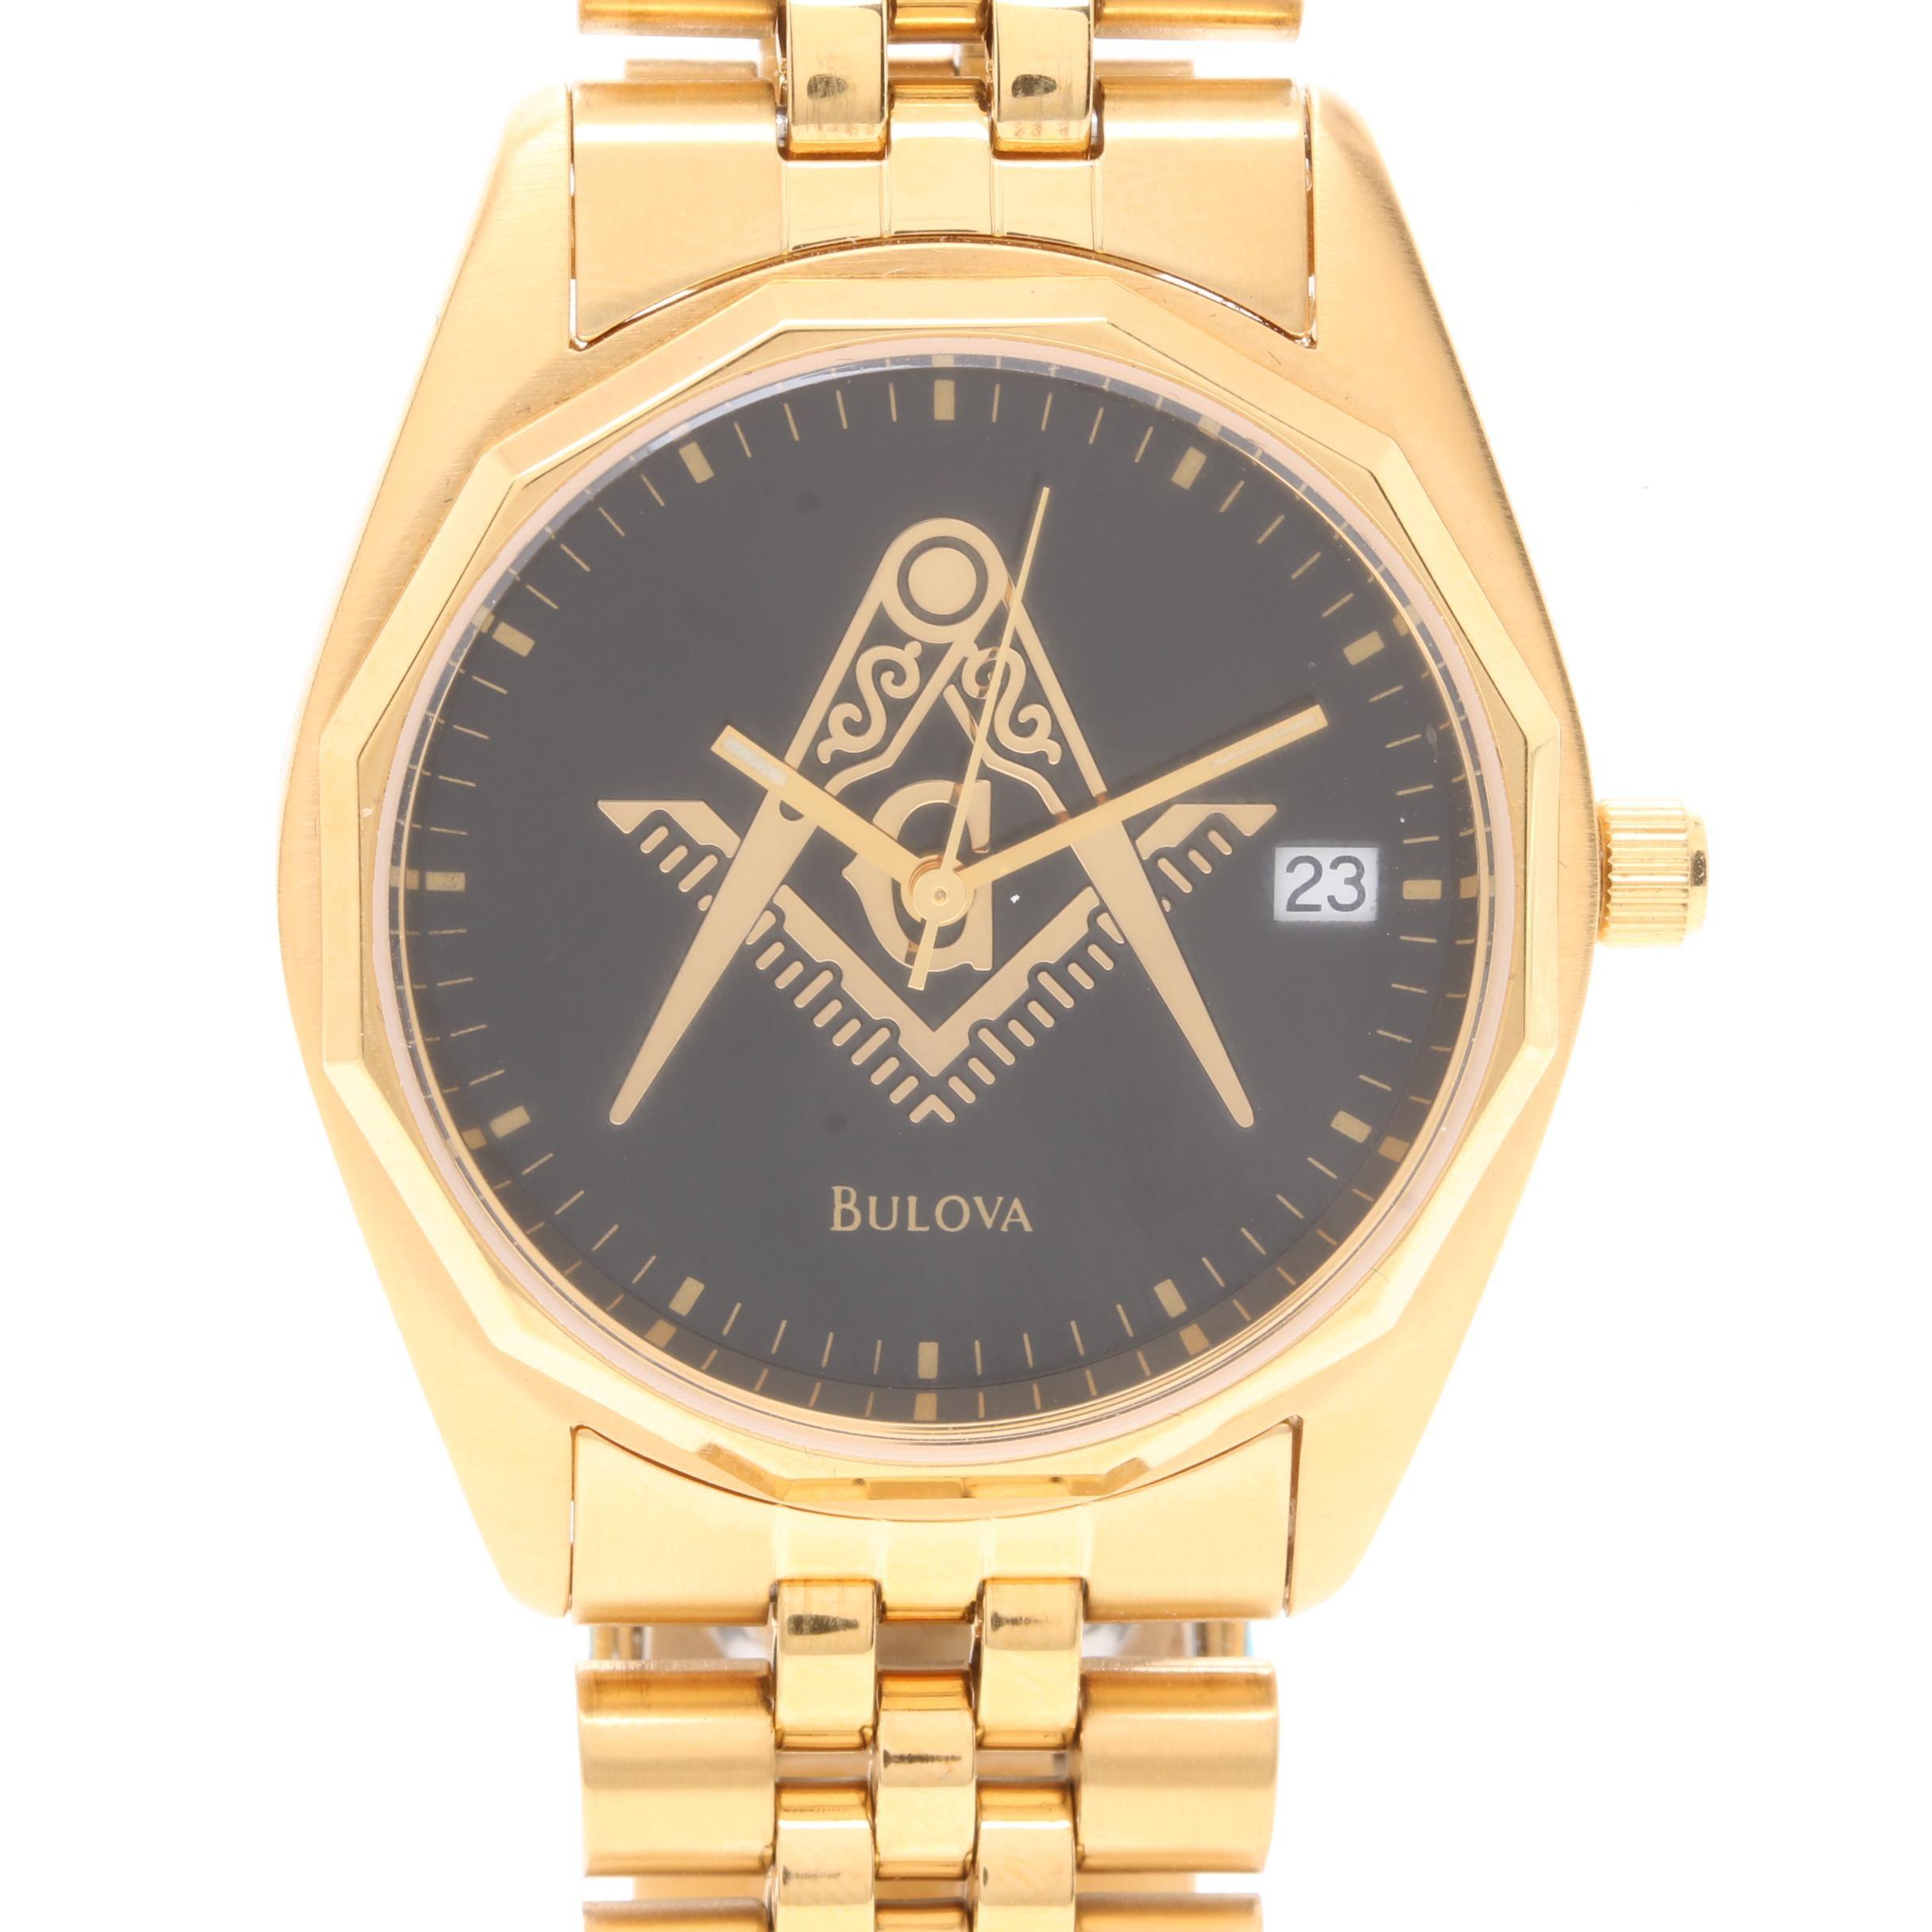 Bulova Gold Tone Masonic Dial Wristwatch with Box